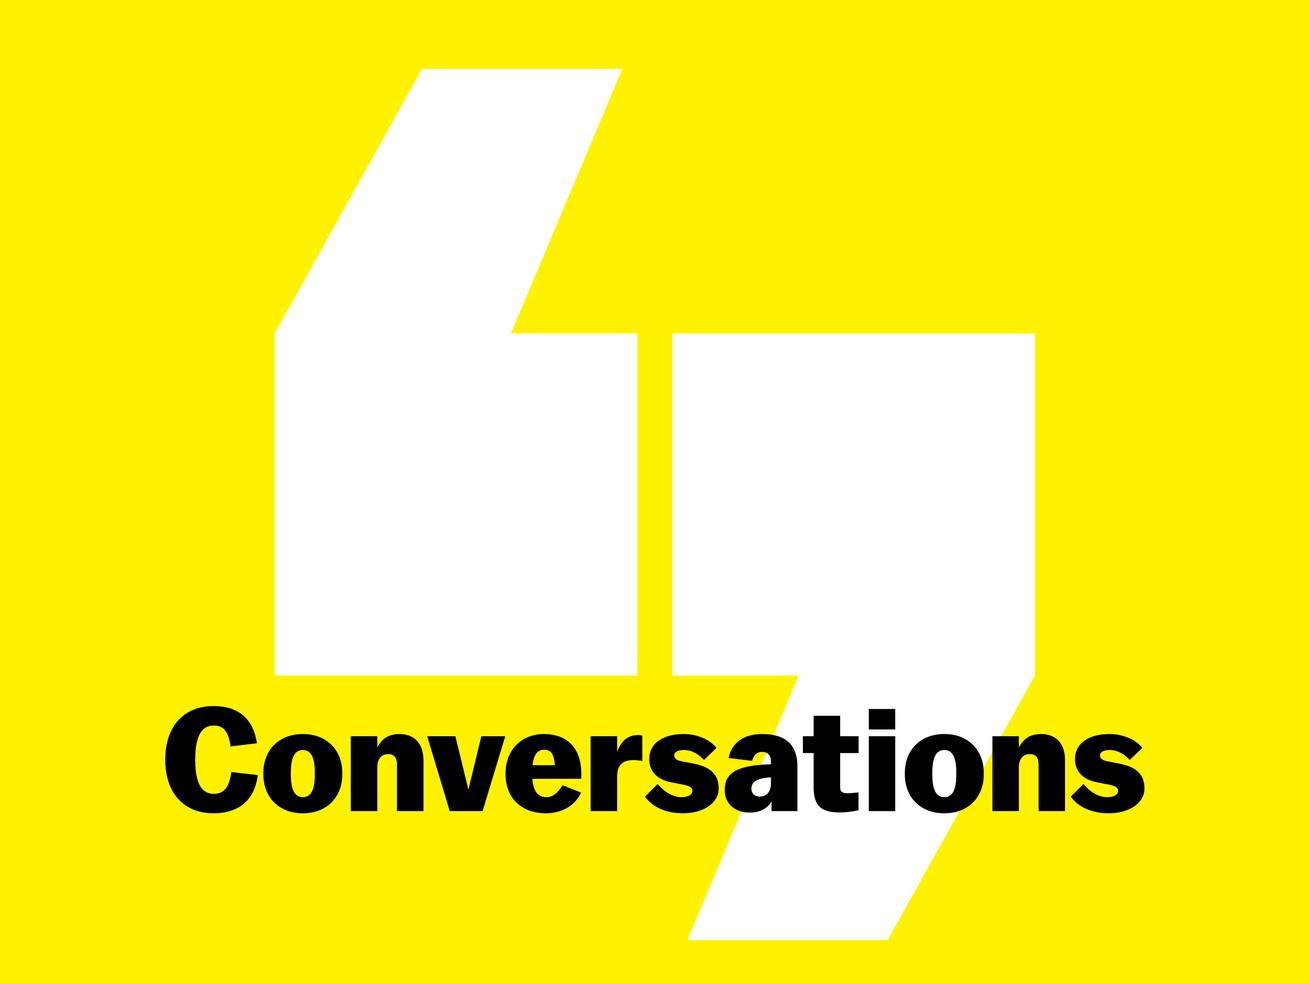 Conversations Vox